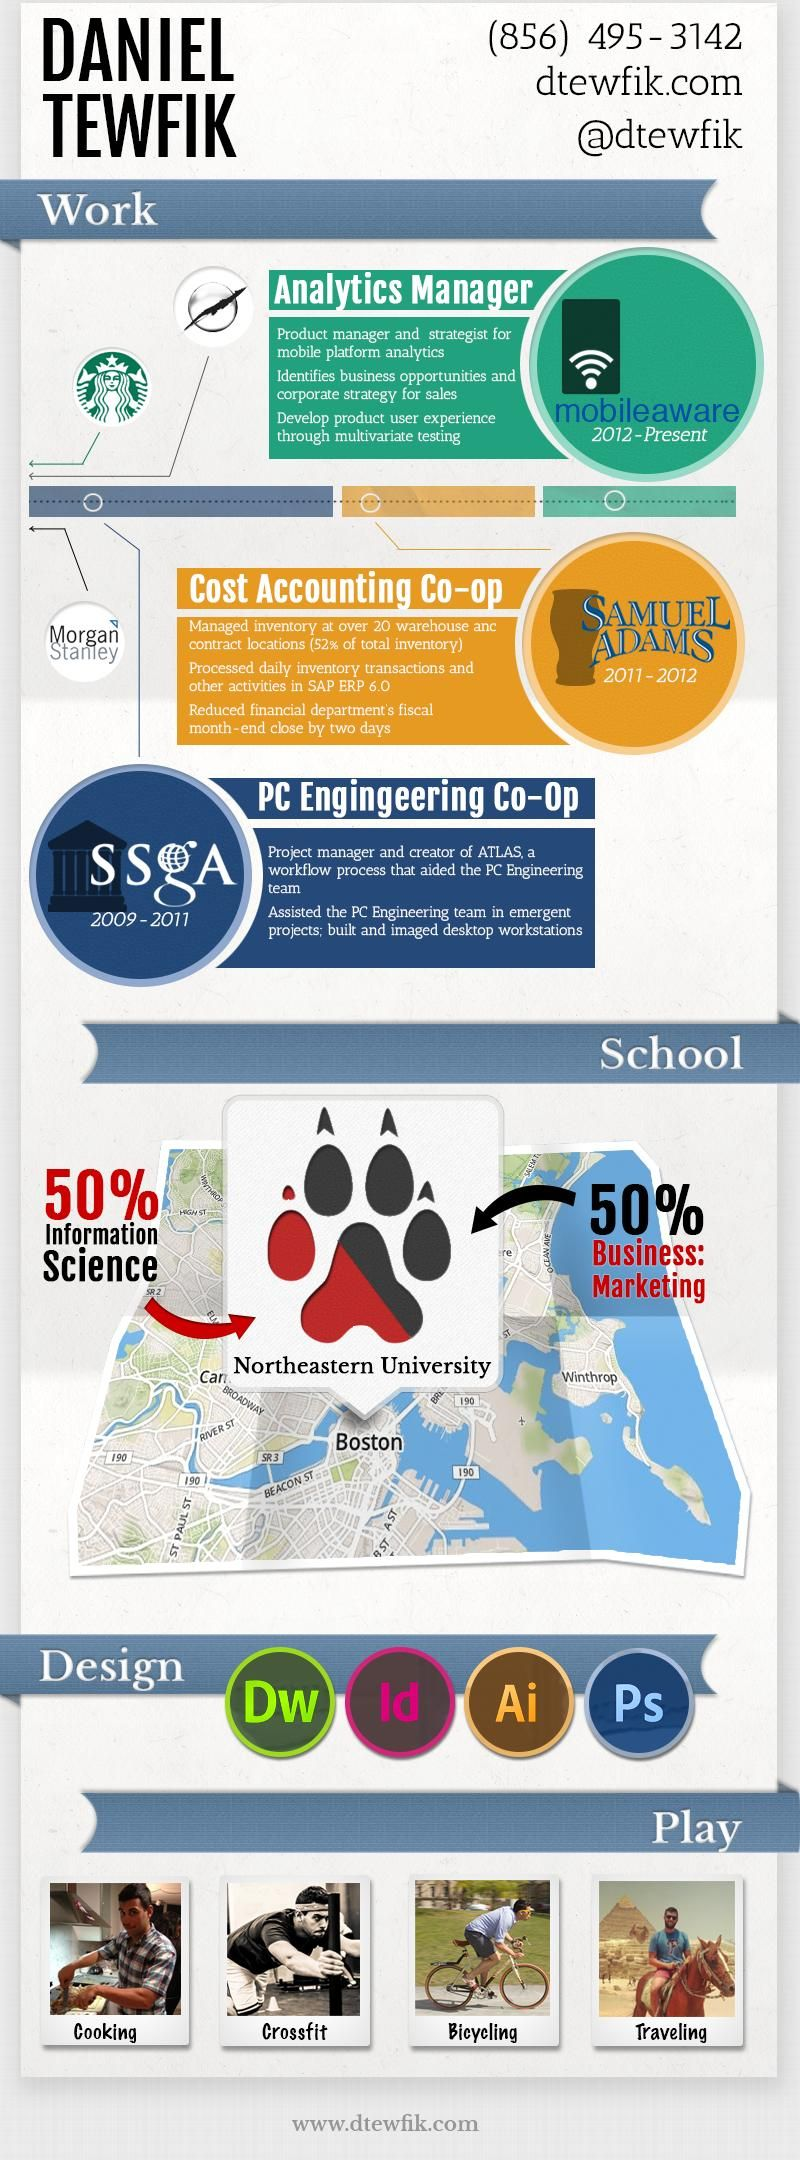 Daniel Tewfik infographic resume | Infographic Visual Resumes ...